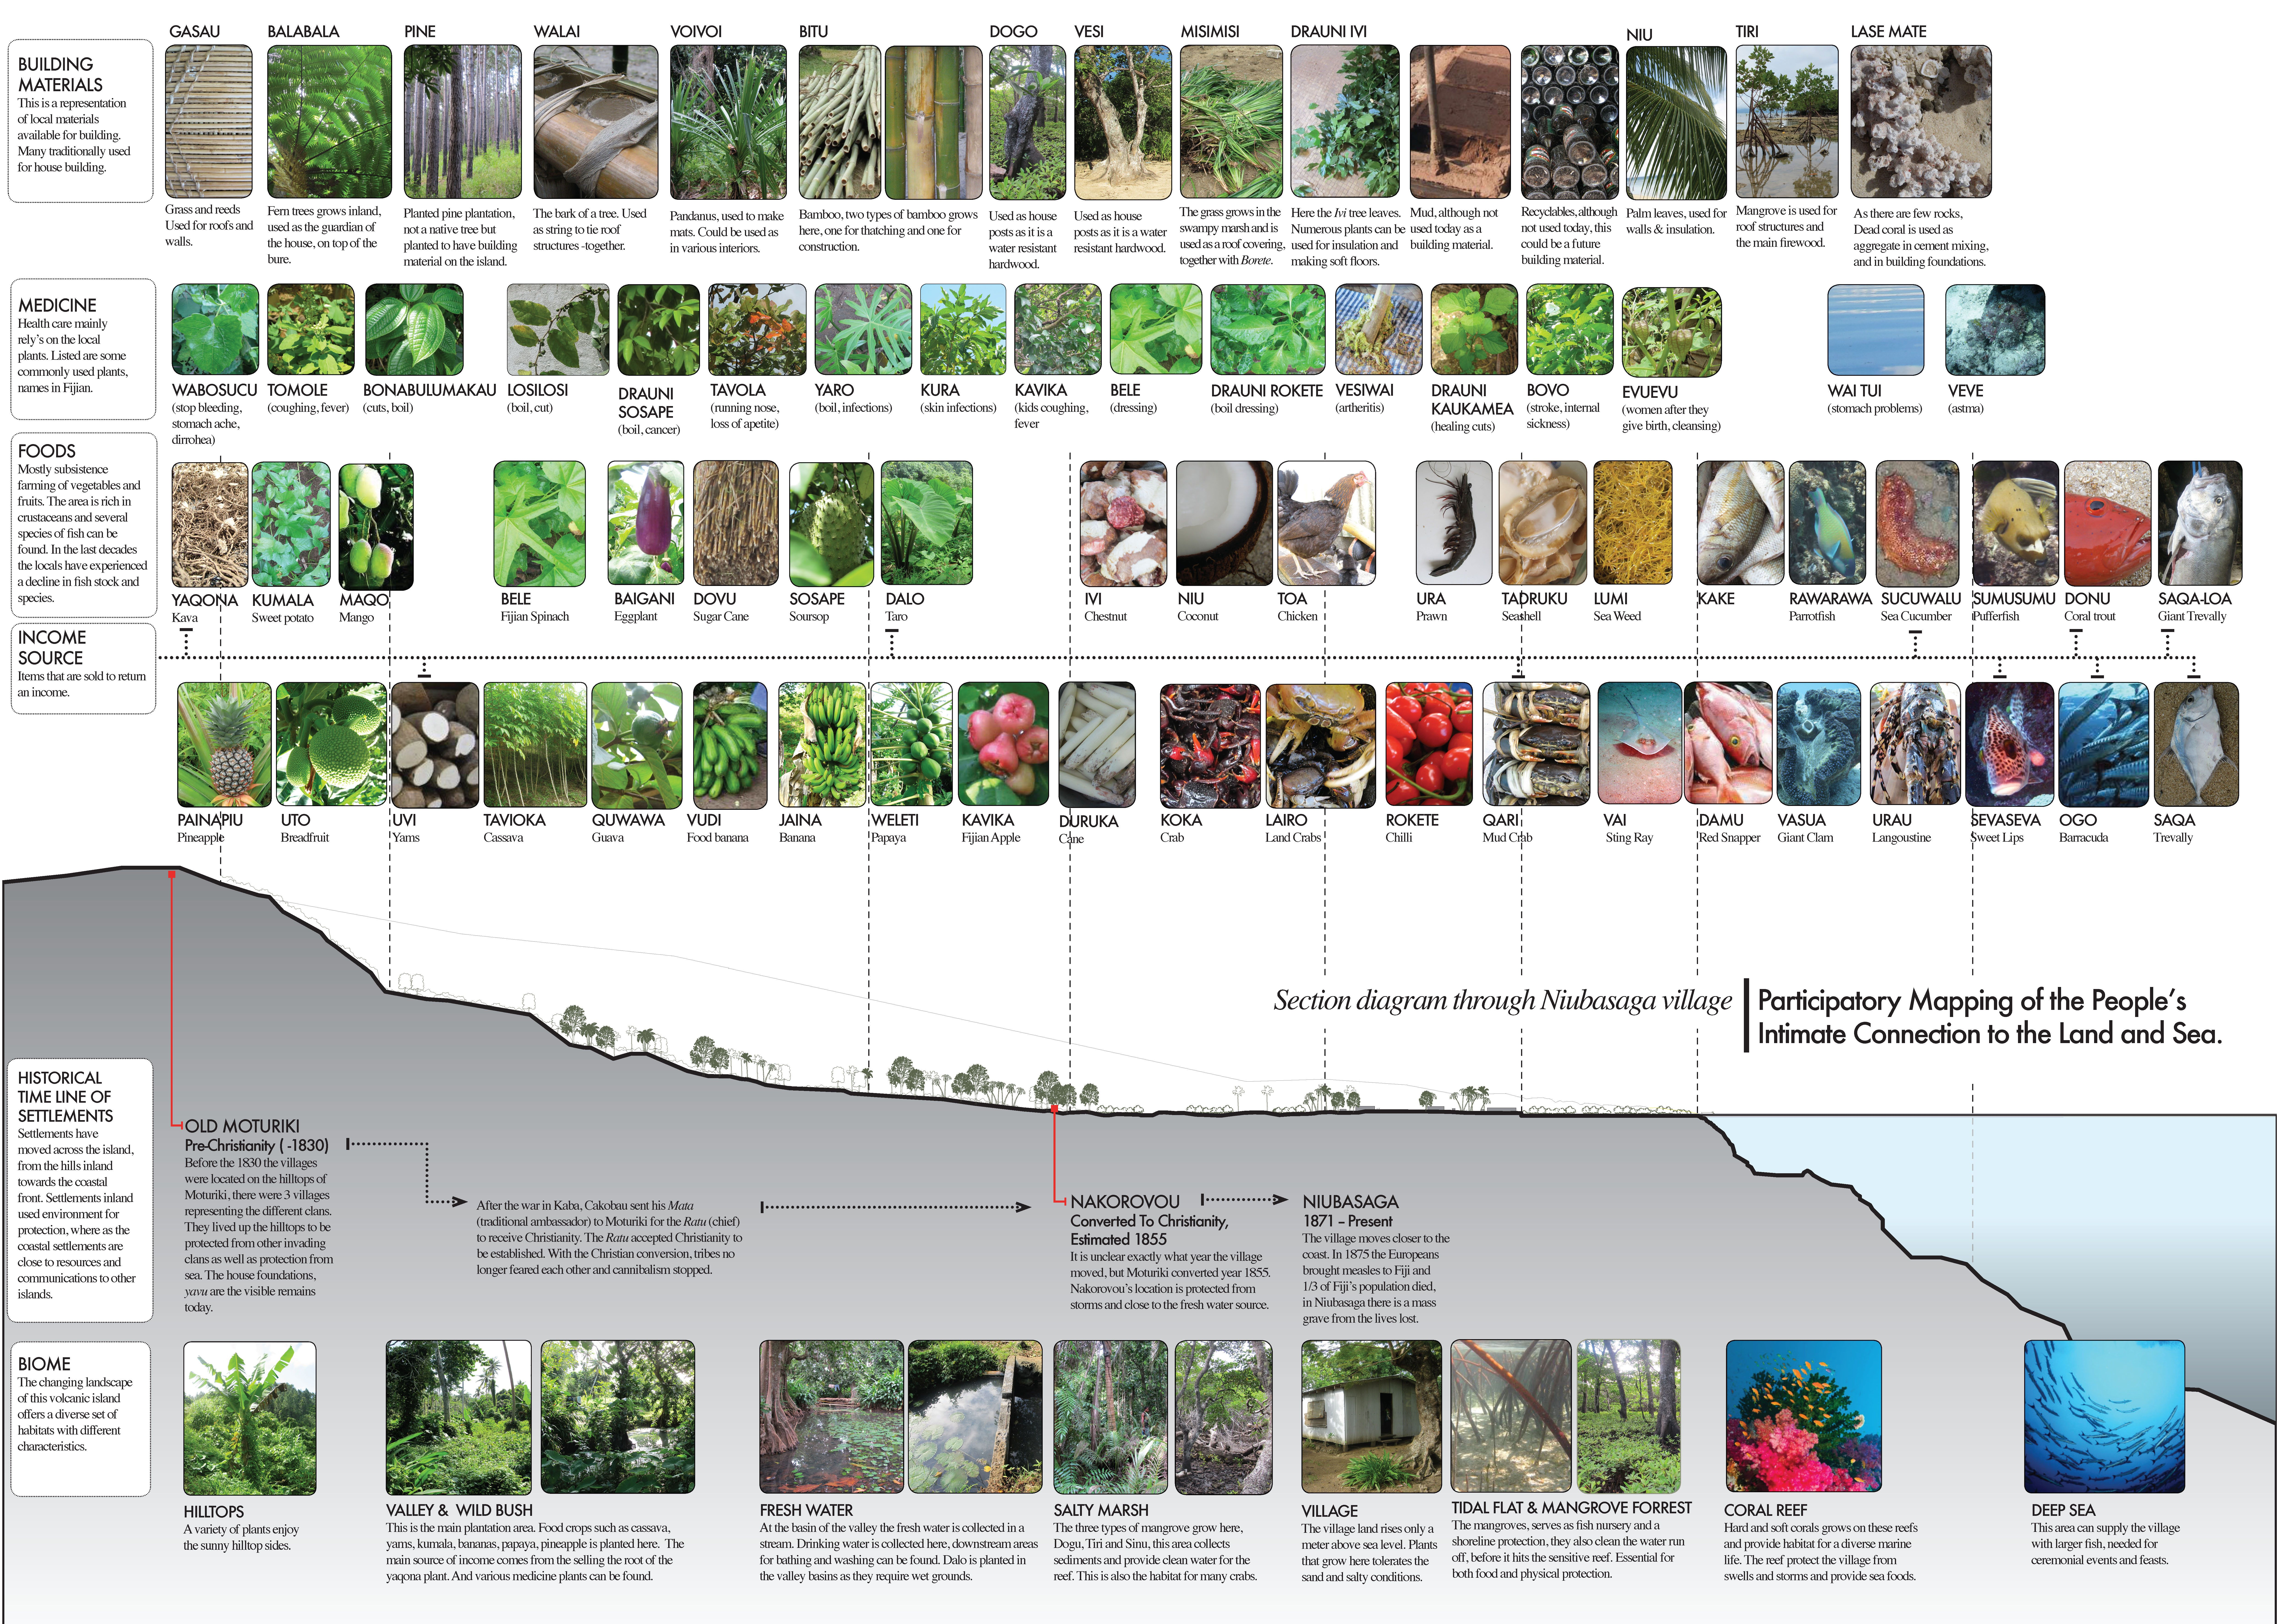 Httpannasundmanleswordpress20121110 landscape httpannasundmanleswordpress20121110 landscape section diagramg arch presentation board pinterest arch and architecture pooptronica Gallery